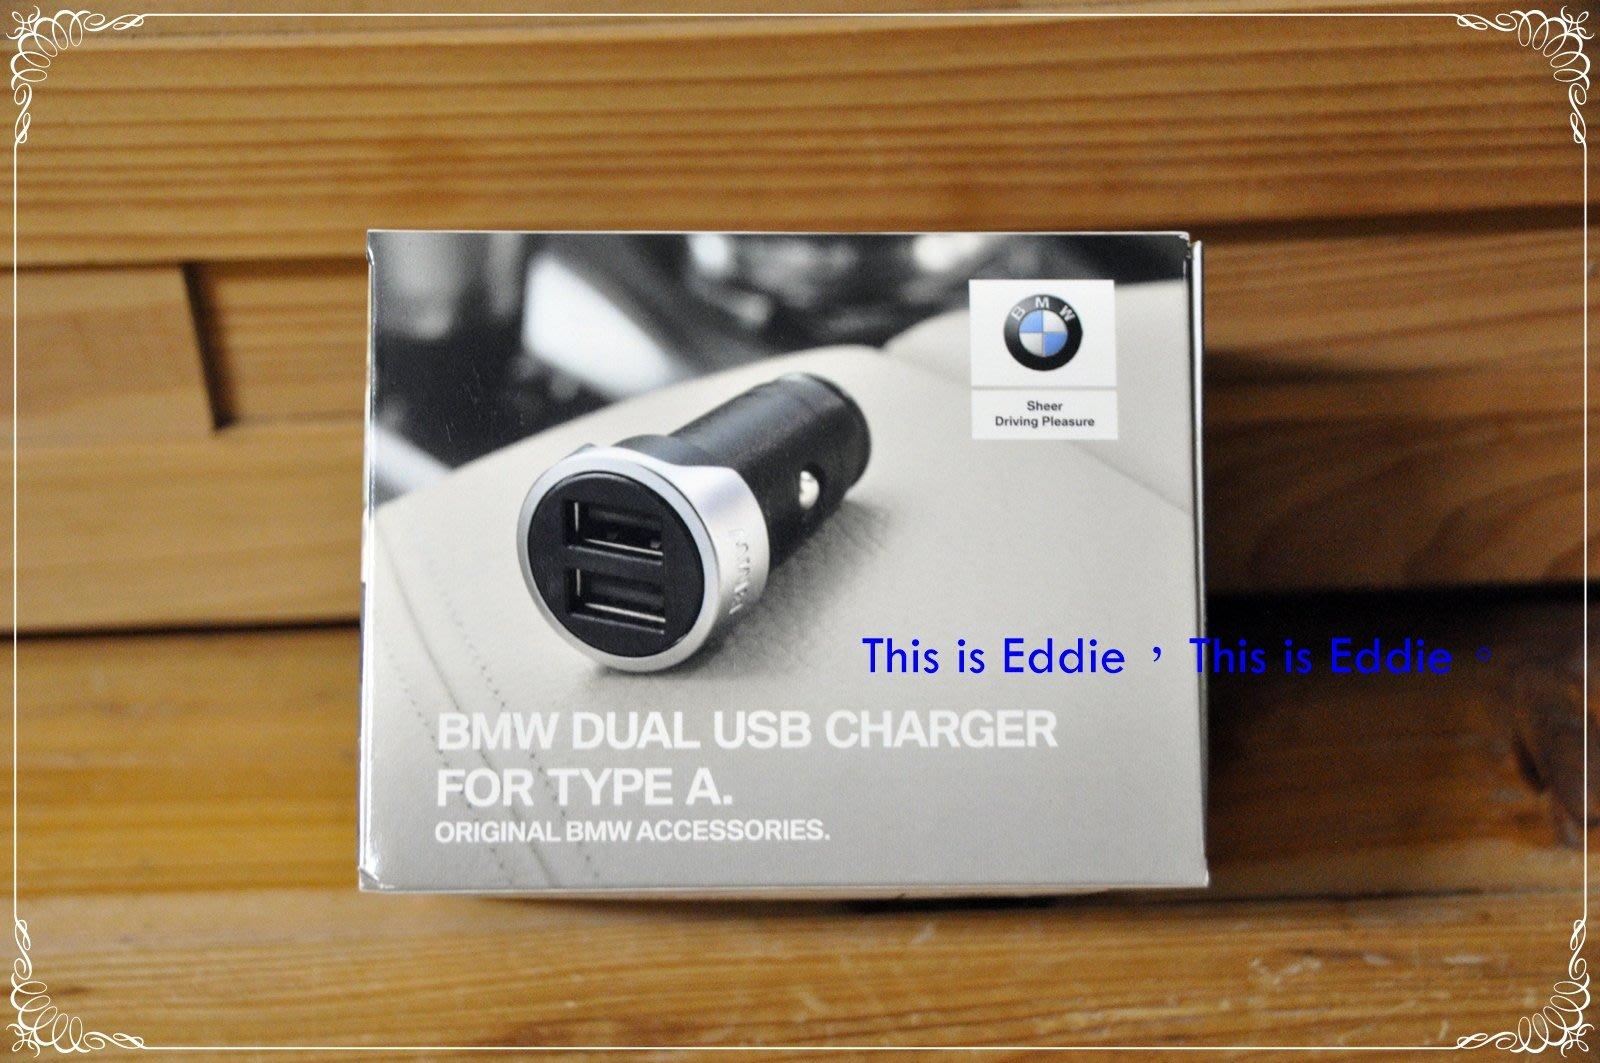 【This is Eddie】BMW德國原廠精品~最新車用手機車充 USB 雙孔充電器(雙A)